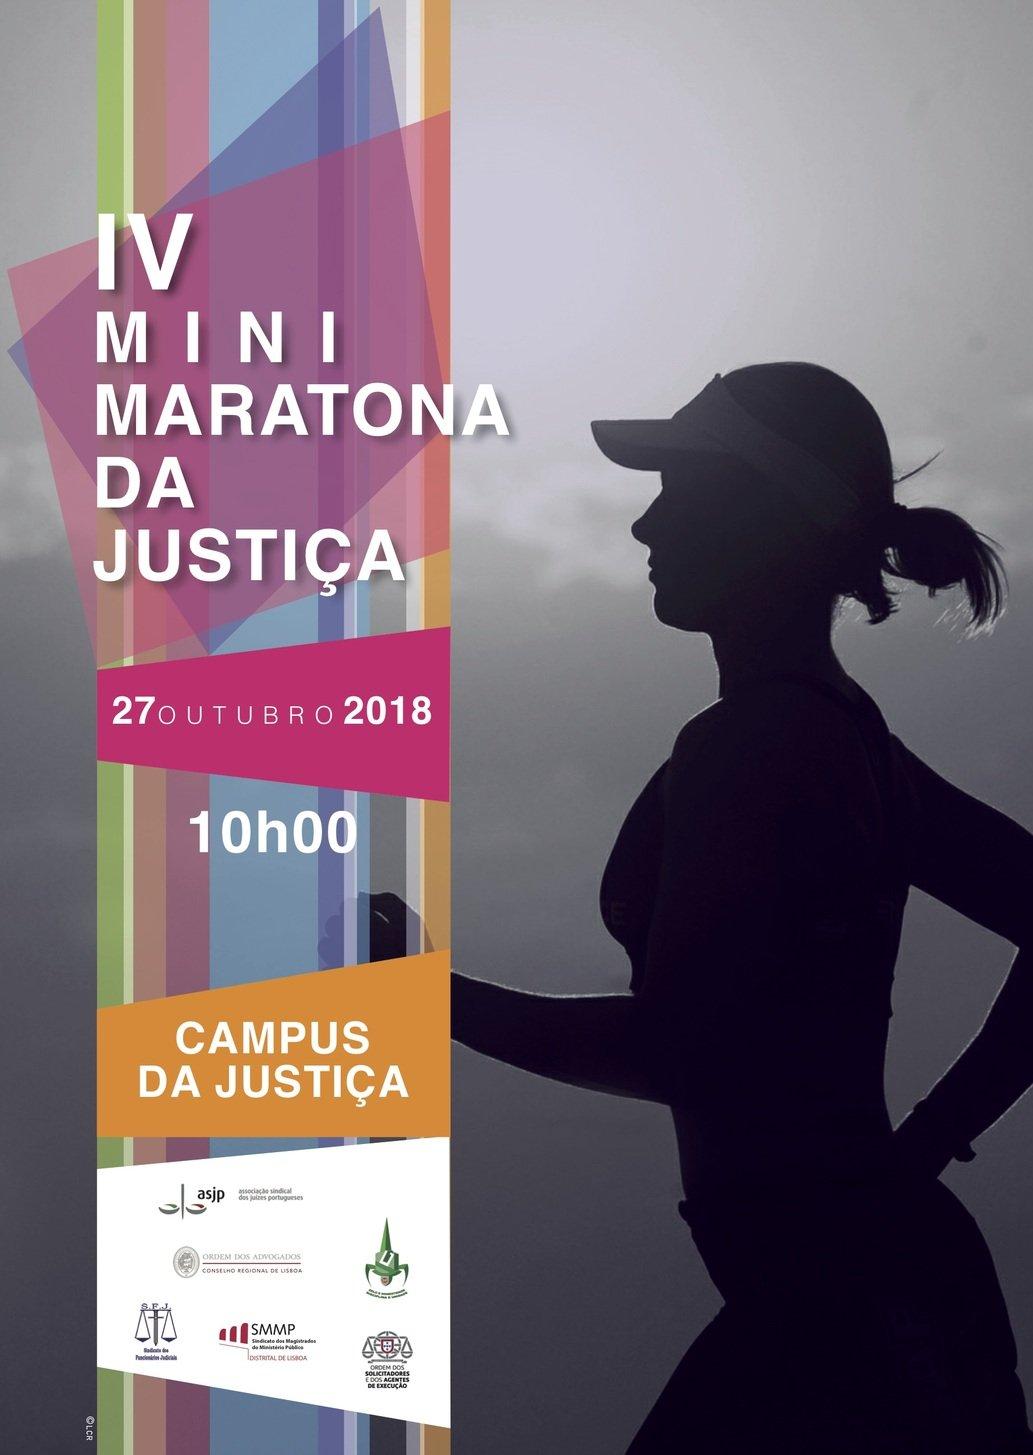 IV MINI MARATONA CAMPUS DA JUSTIÇA